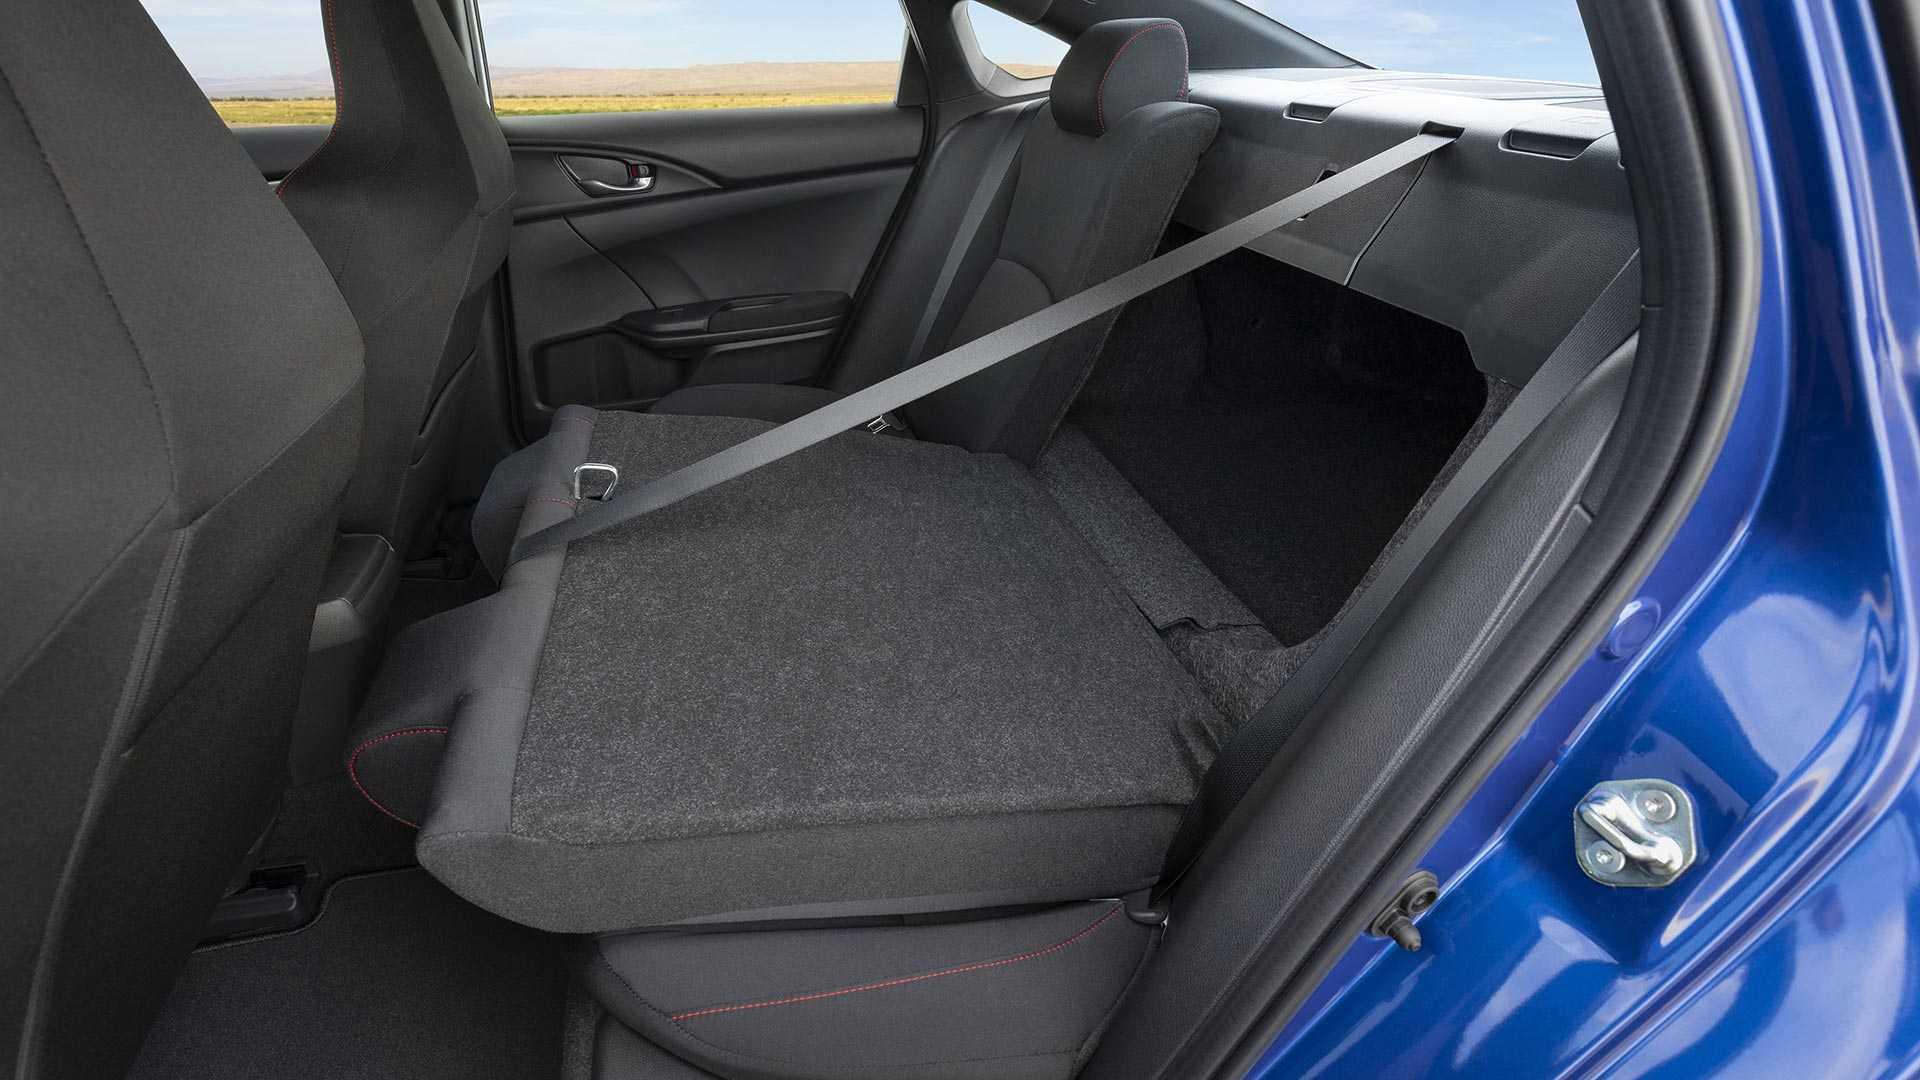 2020 Honda Civic Si Sedan Interior Rear Seats Wallpapers (12)